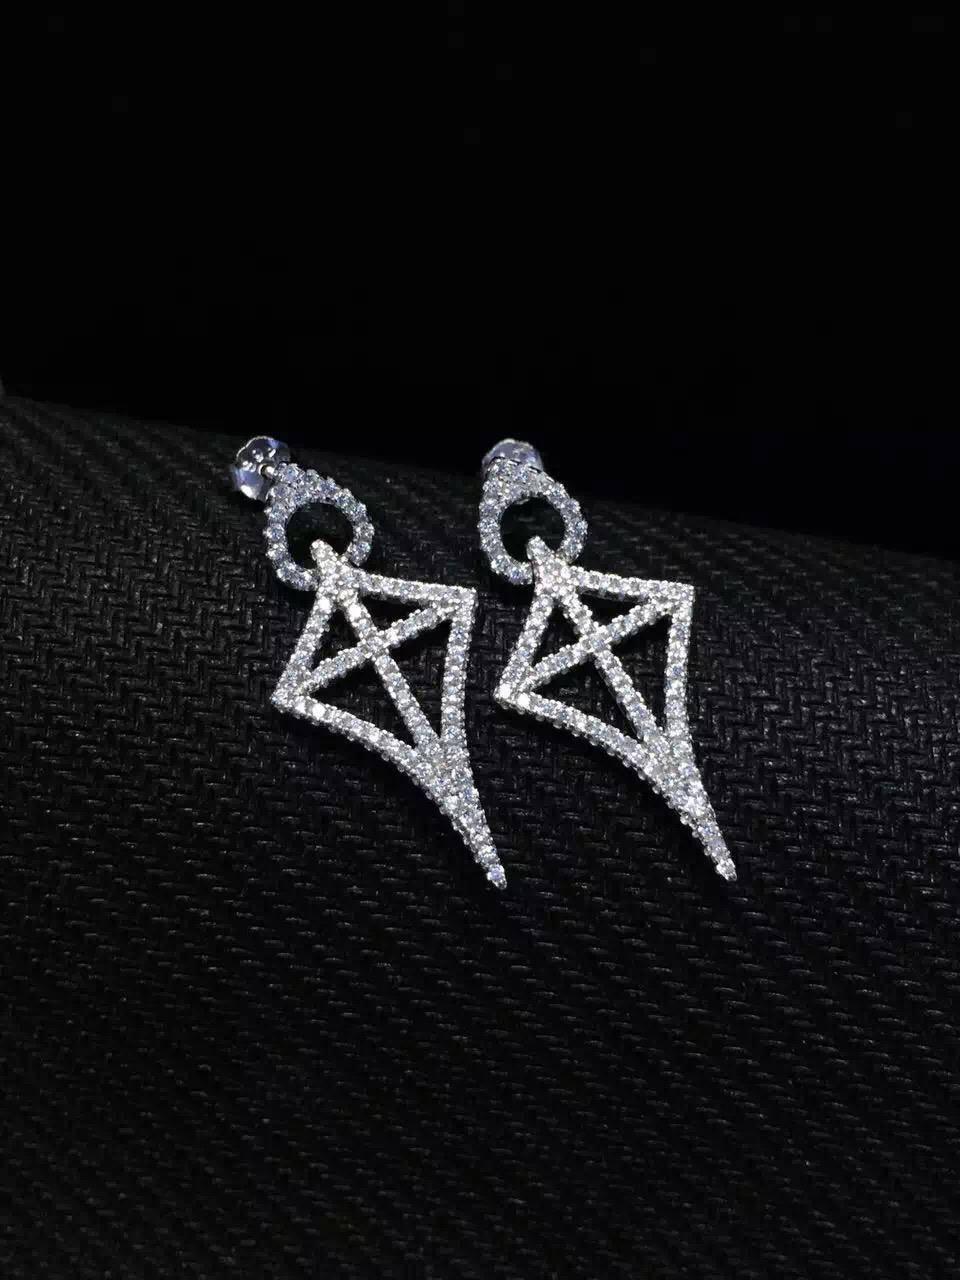 NEFFLY 2016 New Design 925 Sterling silver diamond star stud earrings Fashion Jewelry beautiful.